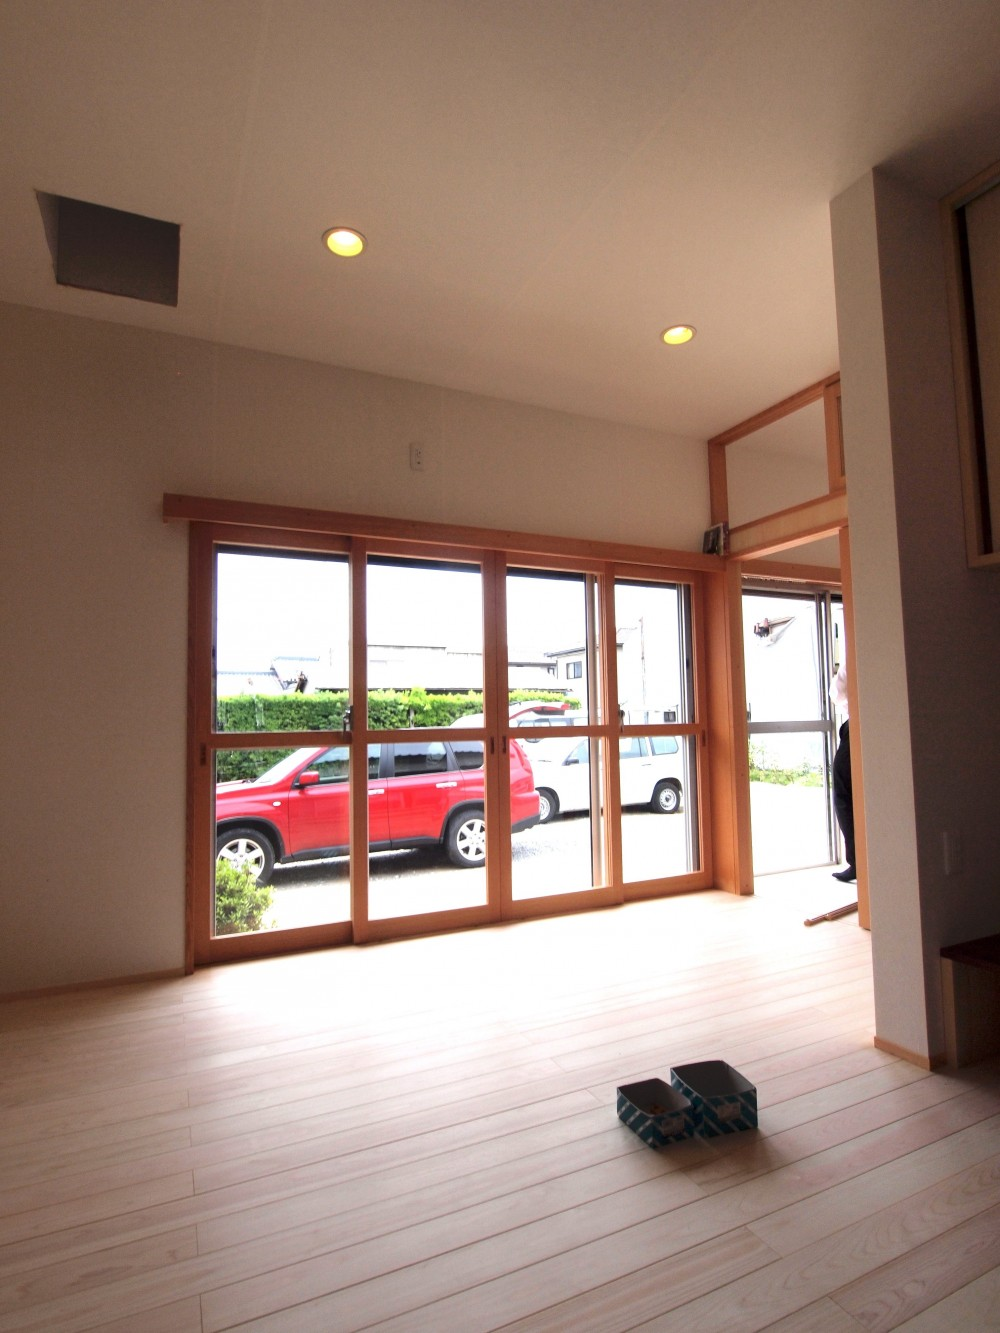 Tさま邸母屋リノベーション (リビングの掃き出し窓)